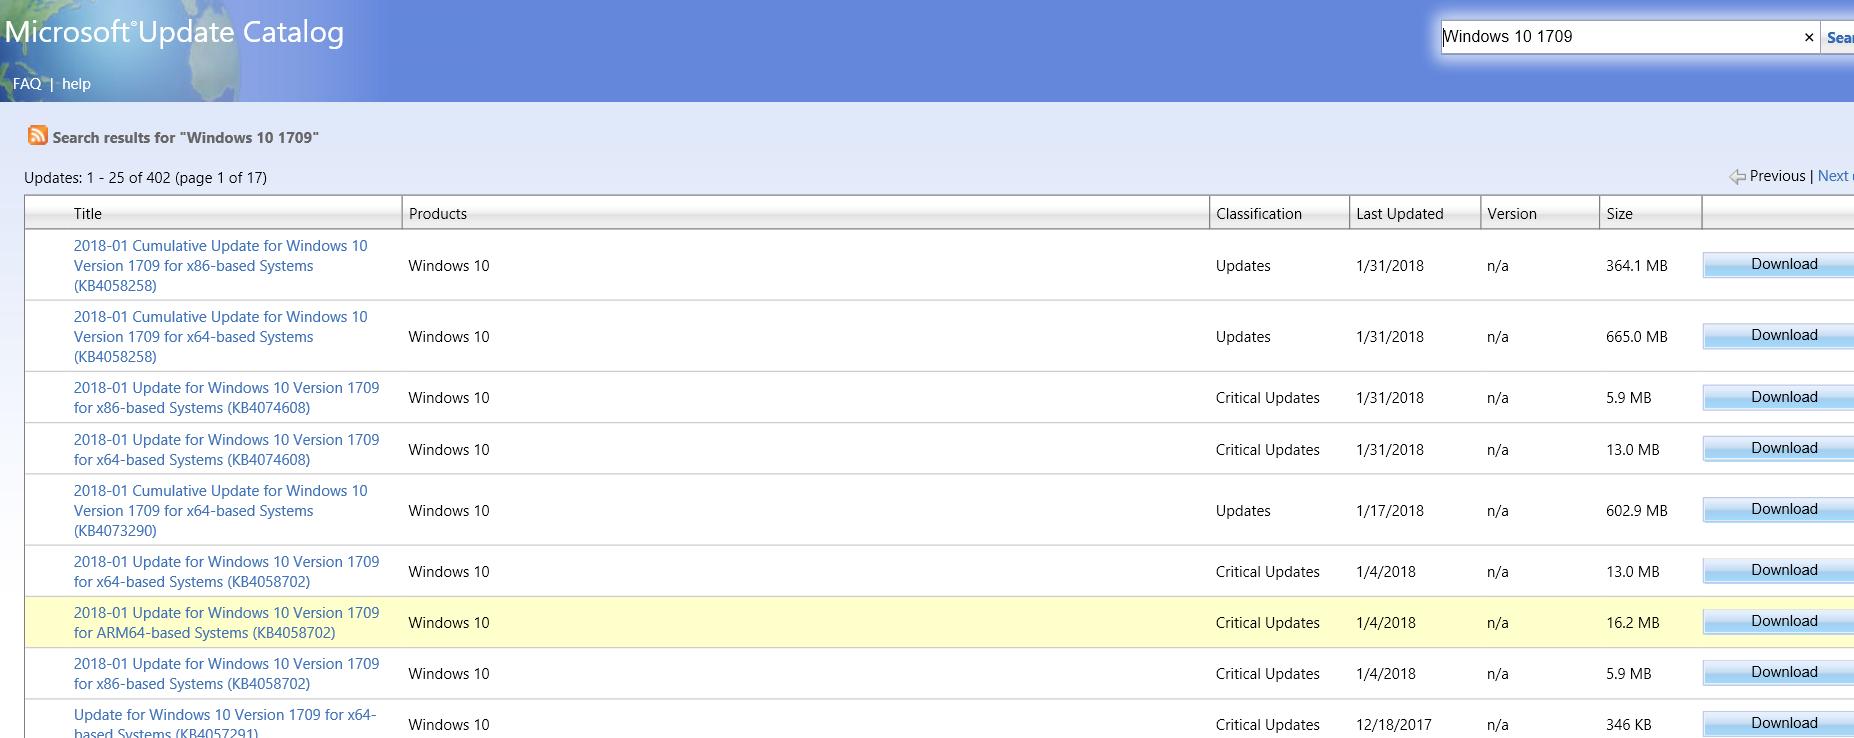 microsoft update catalog windows 10 version 1703